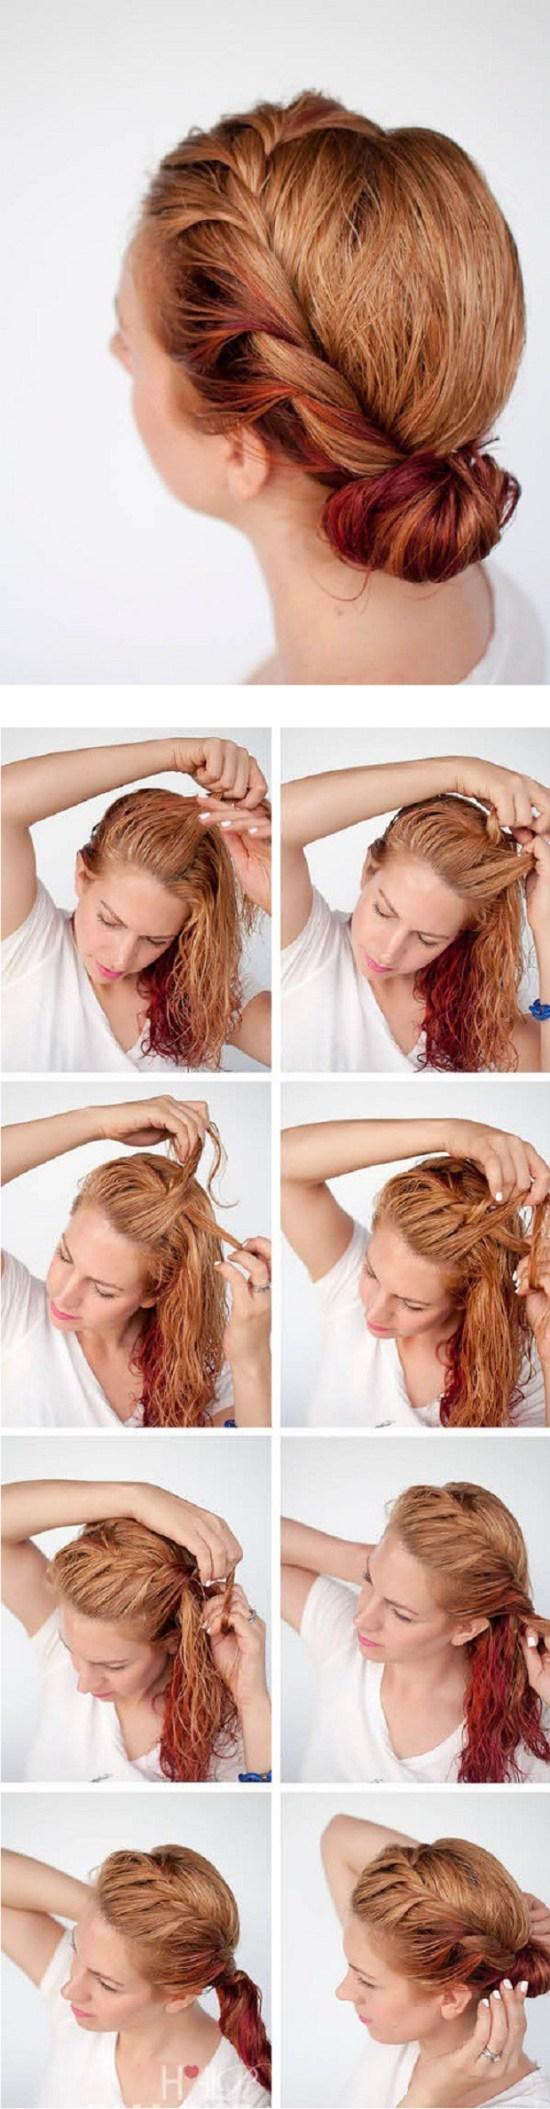 peinado diadema